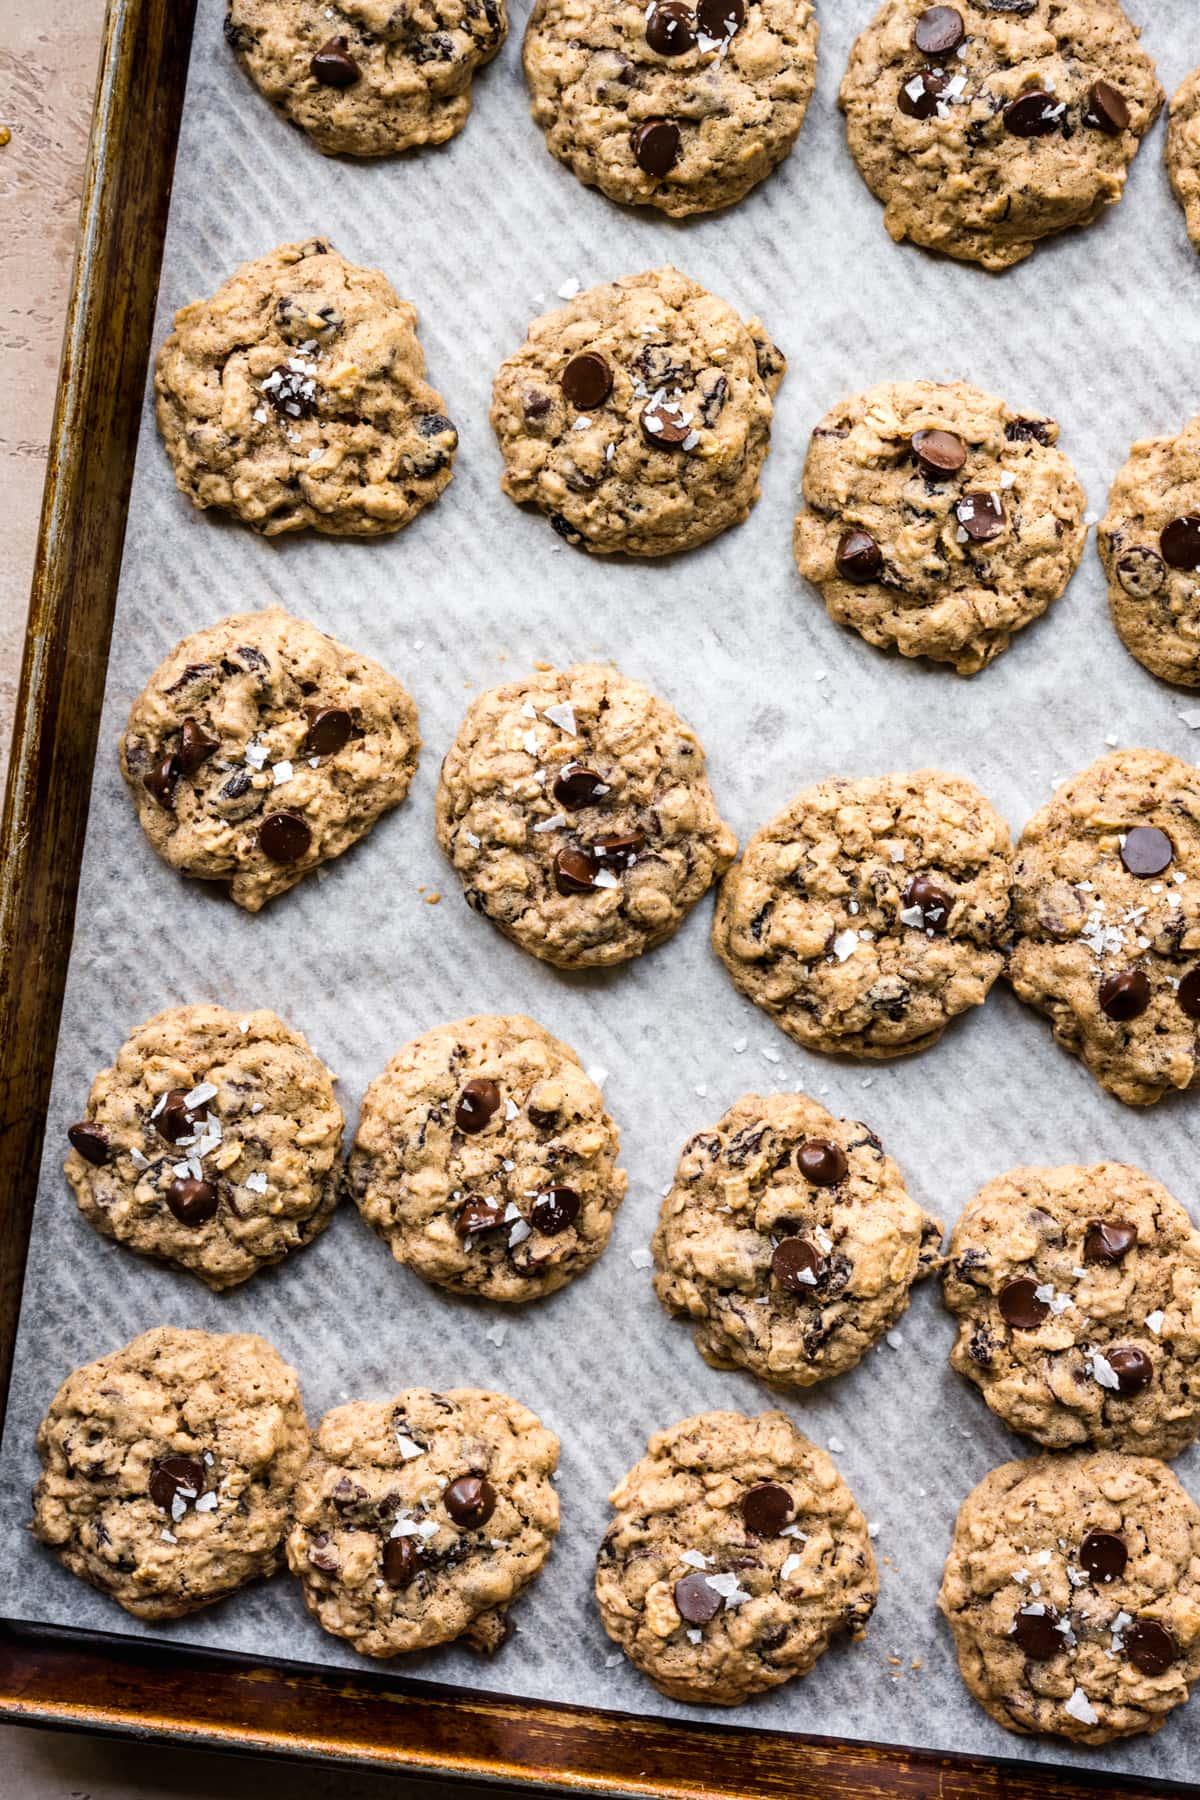 overhead view of vegan gluten free oatmeal raisin cookies on sheet pan